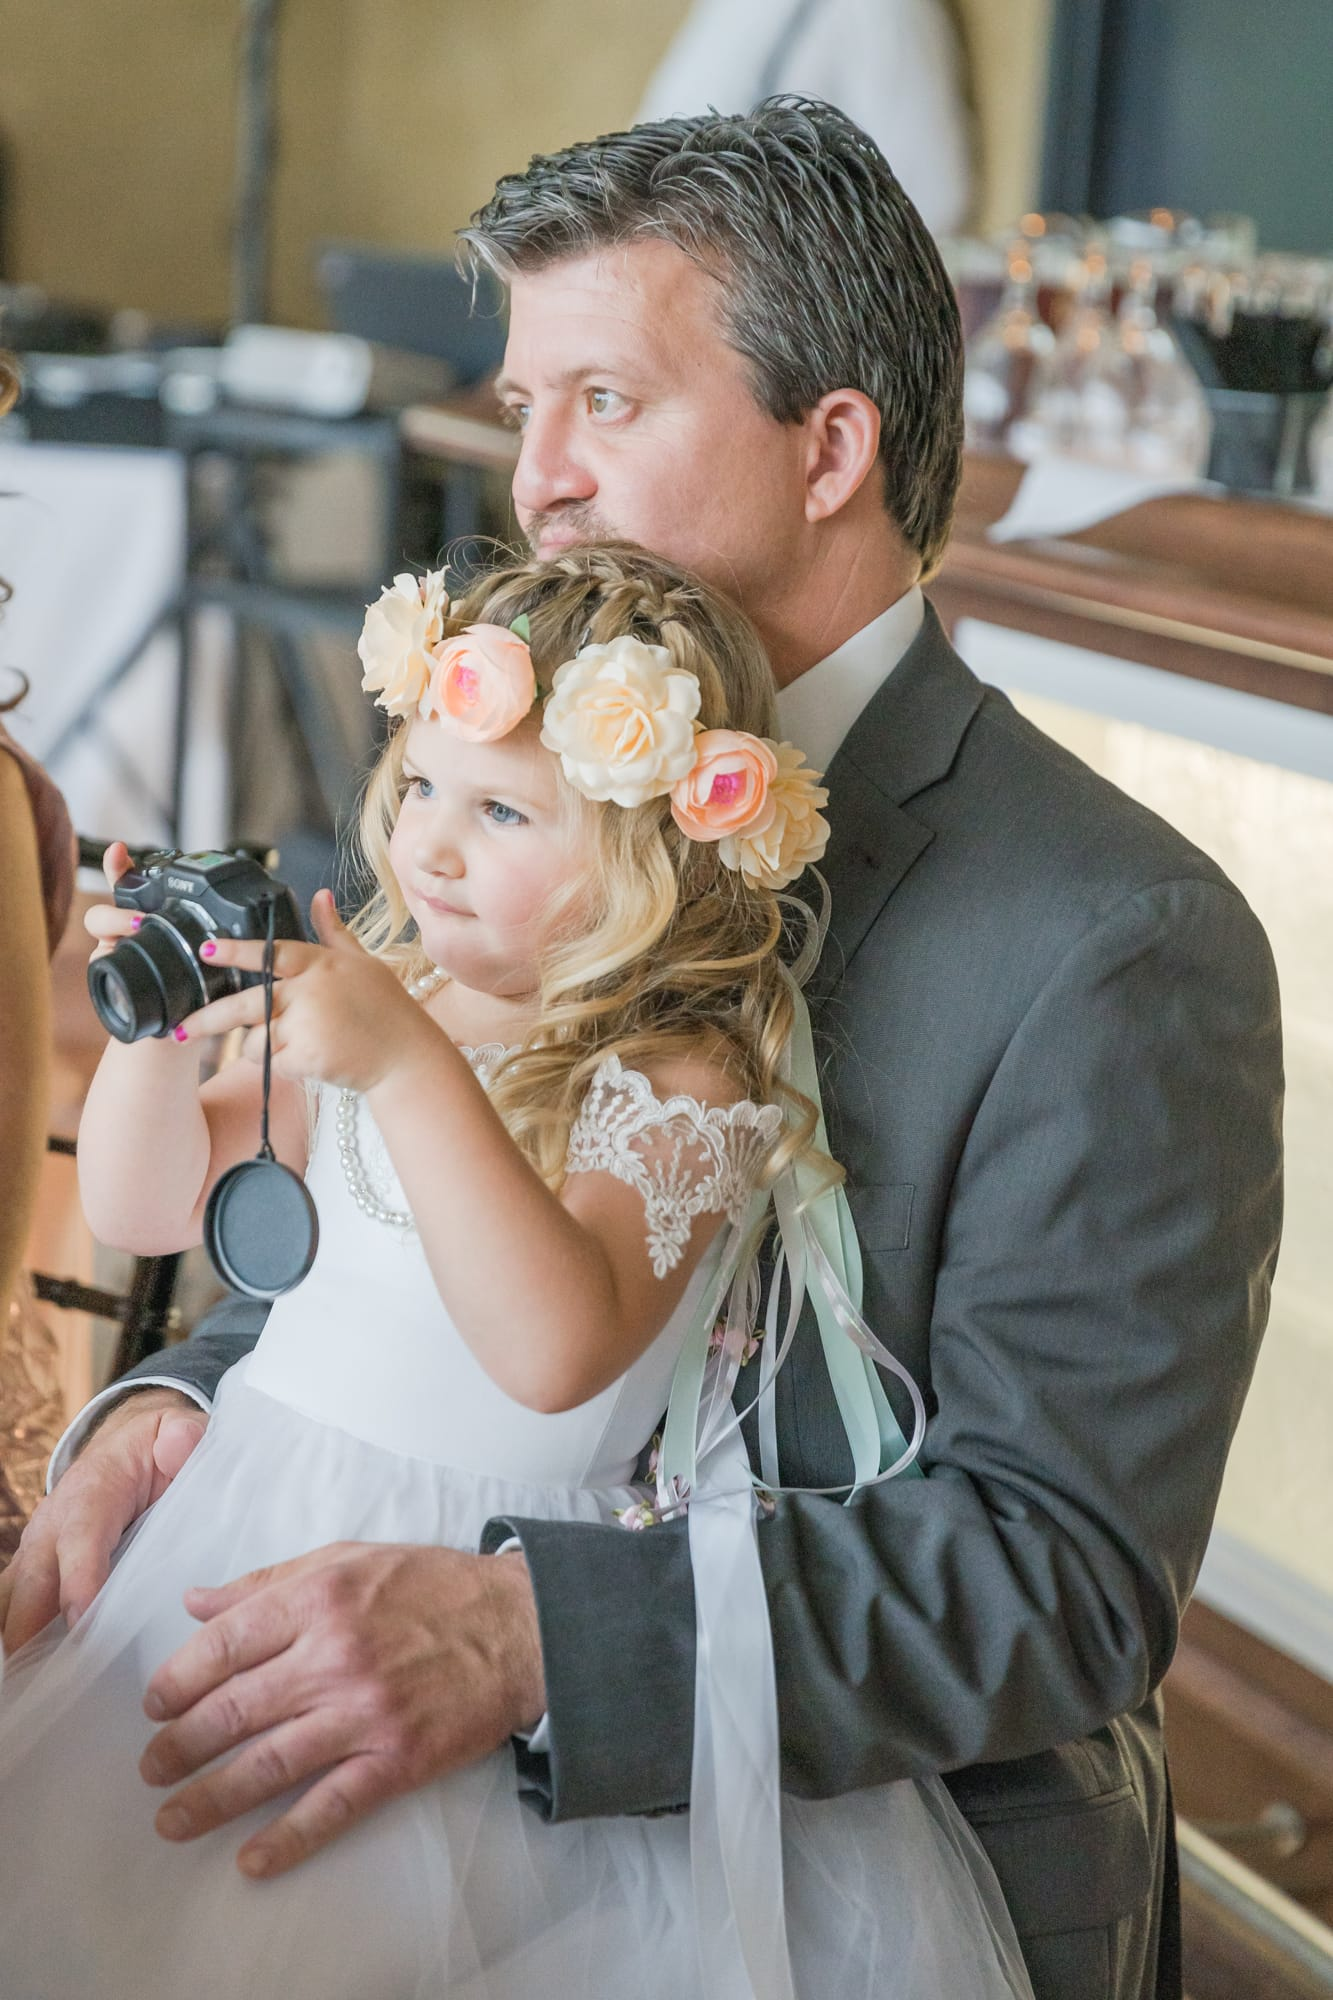 Central Pennsylvania PA summer wedding guest flower girl